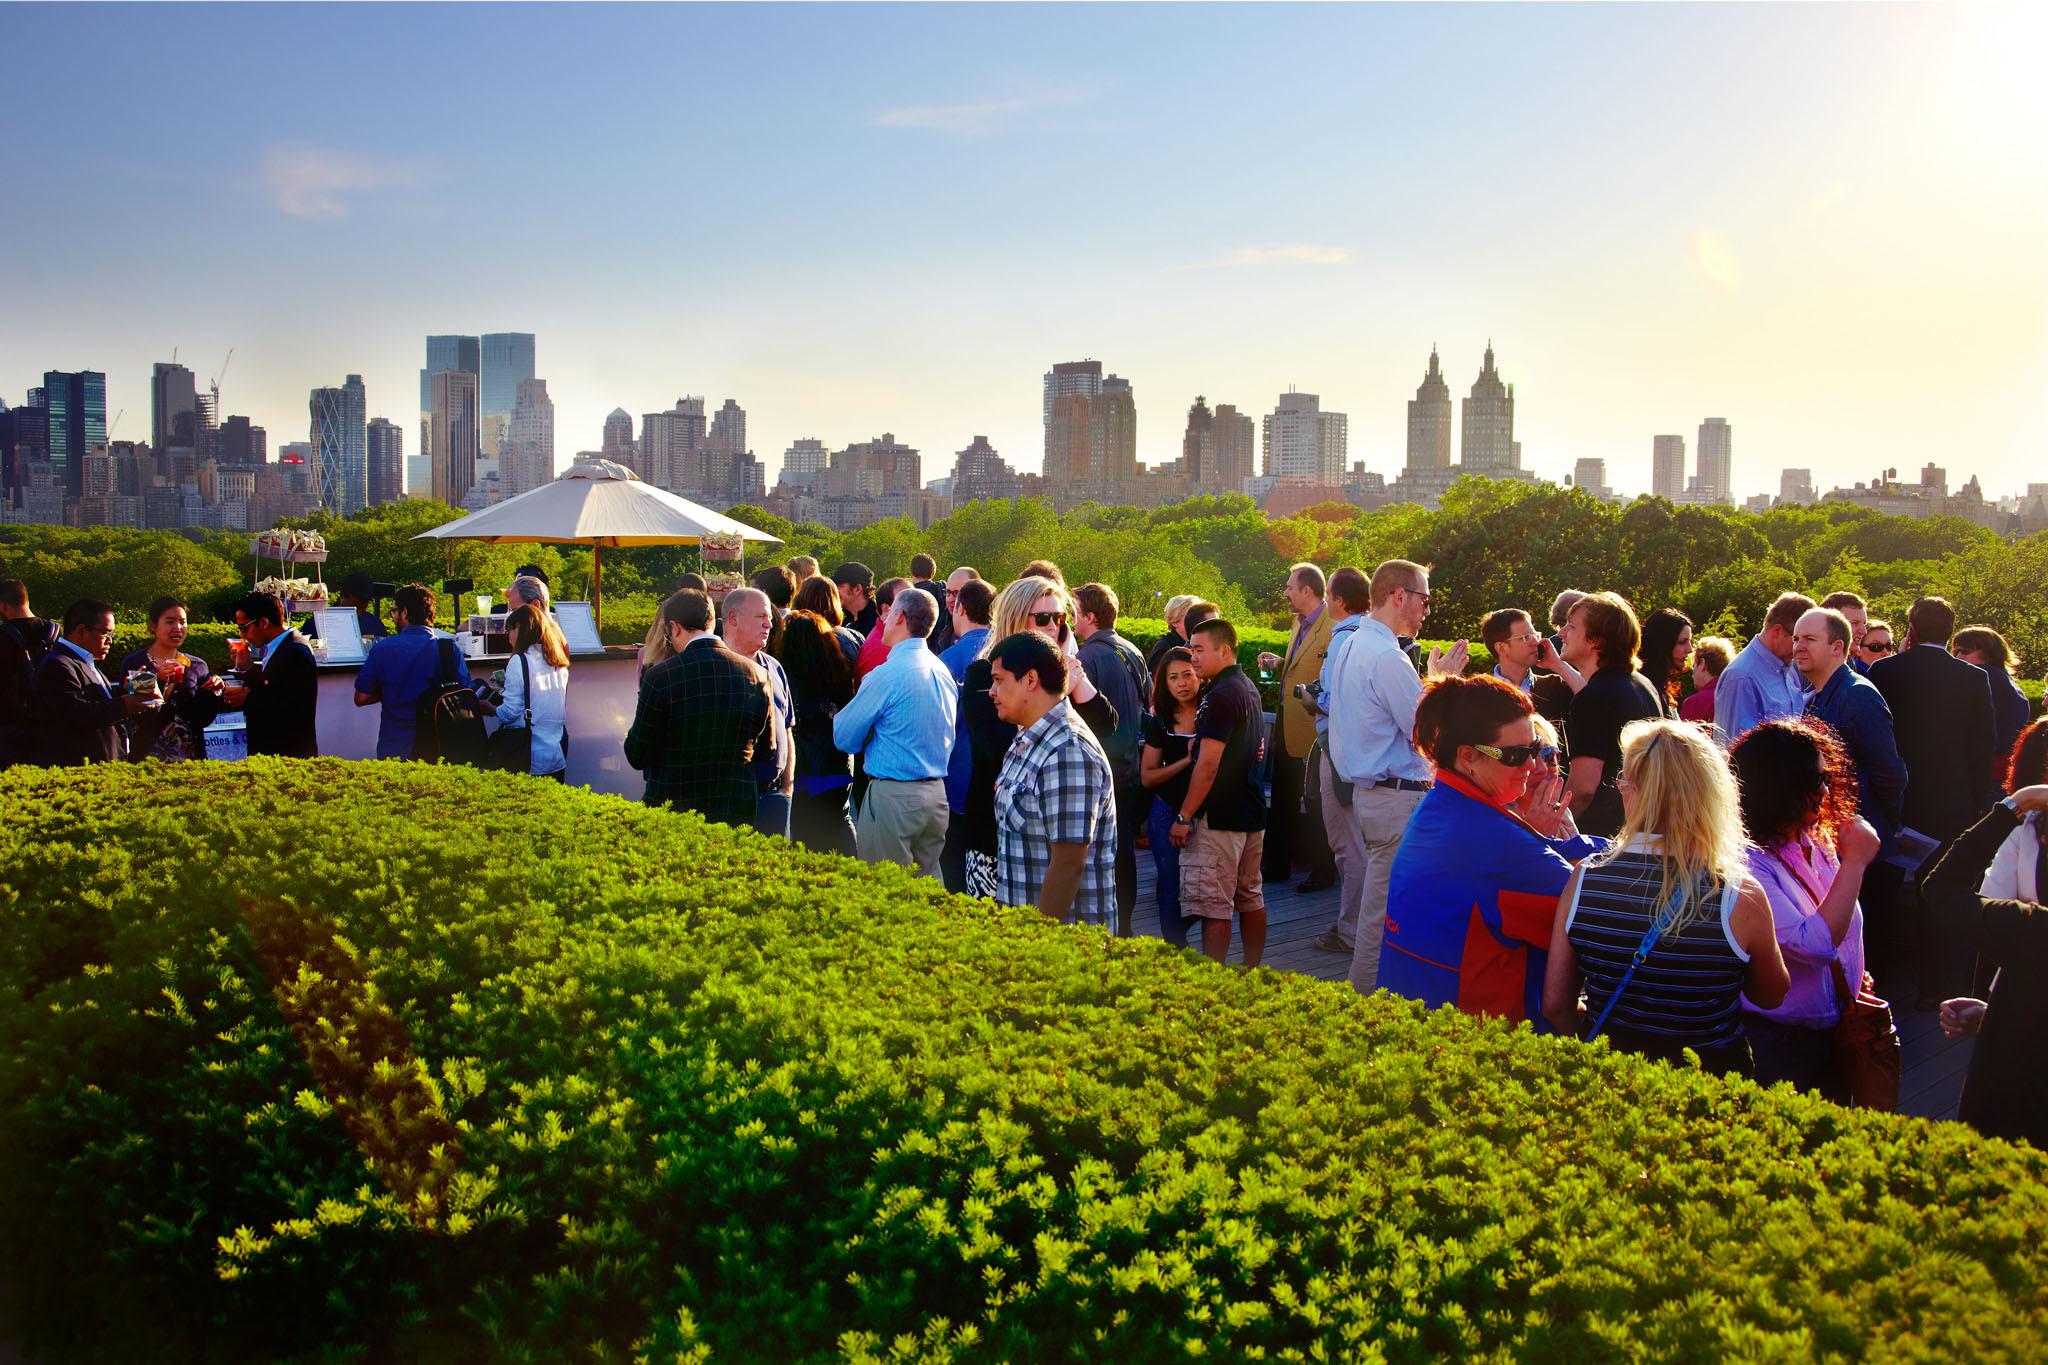 The Metropolitan Museum of Art Roof Garden Café